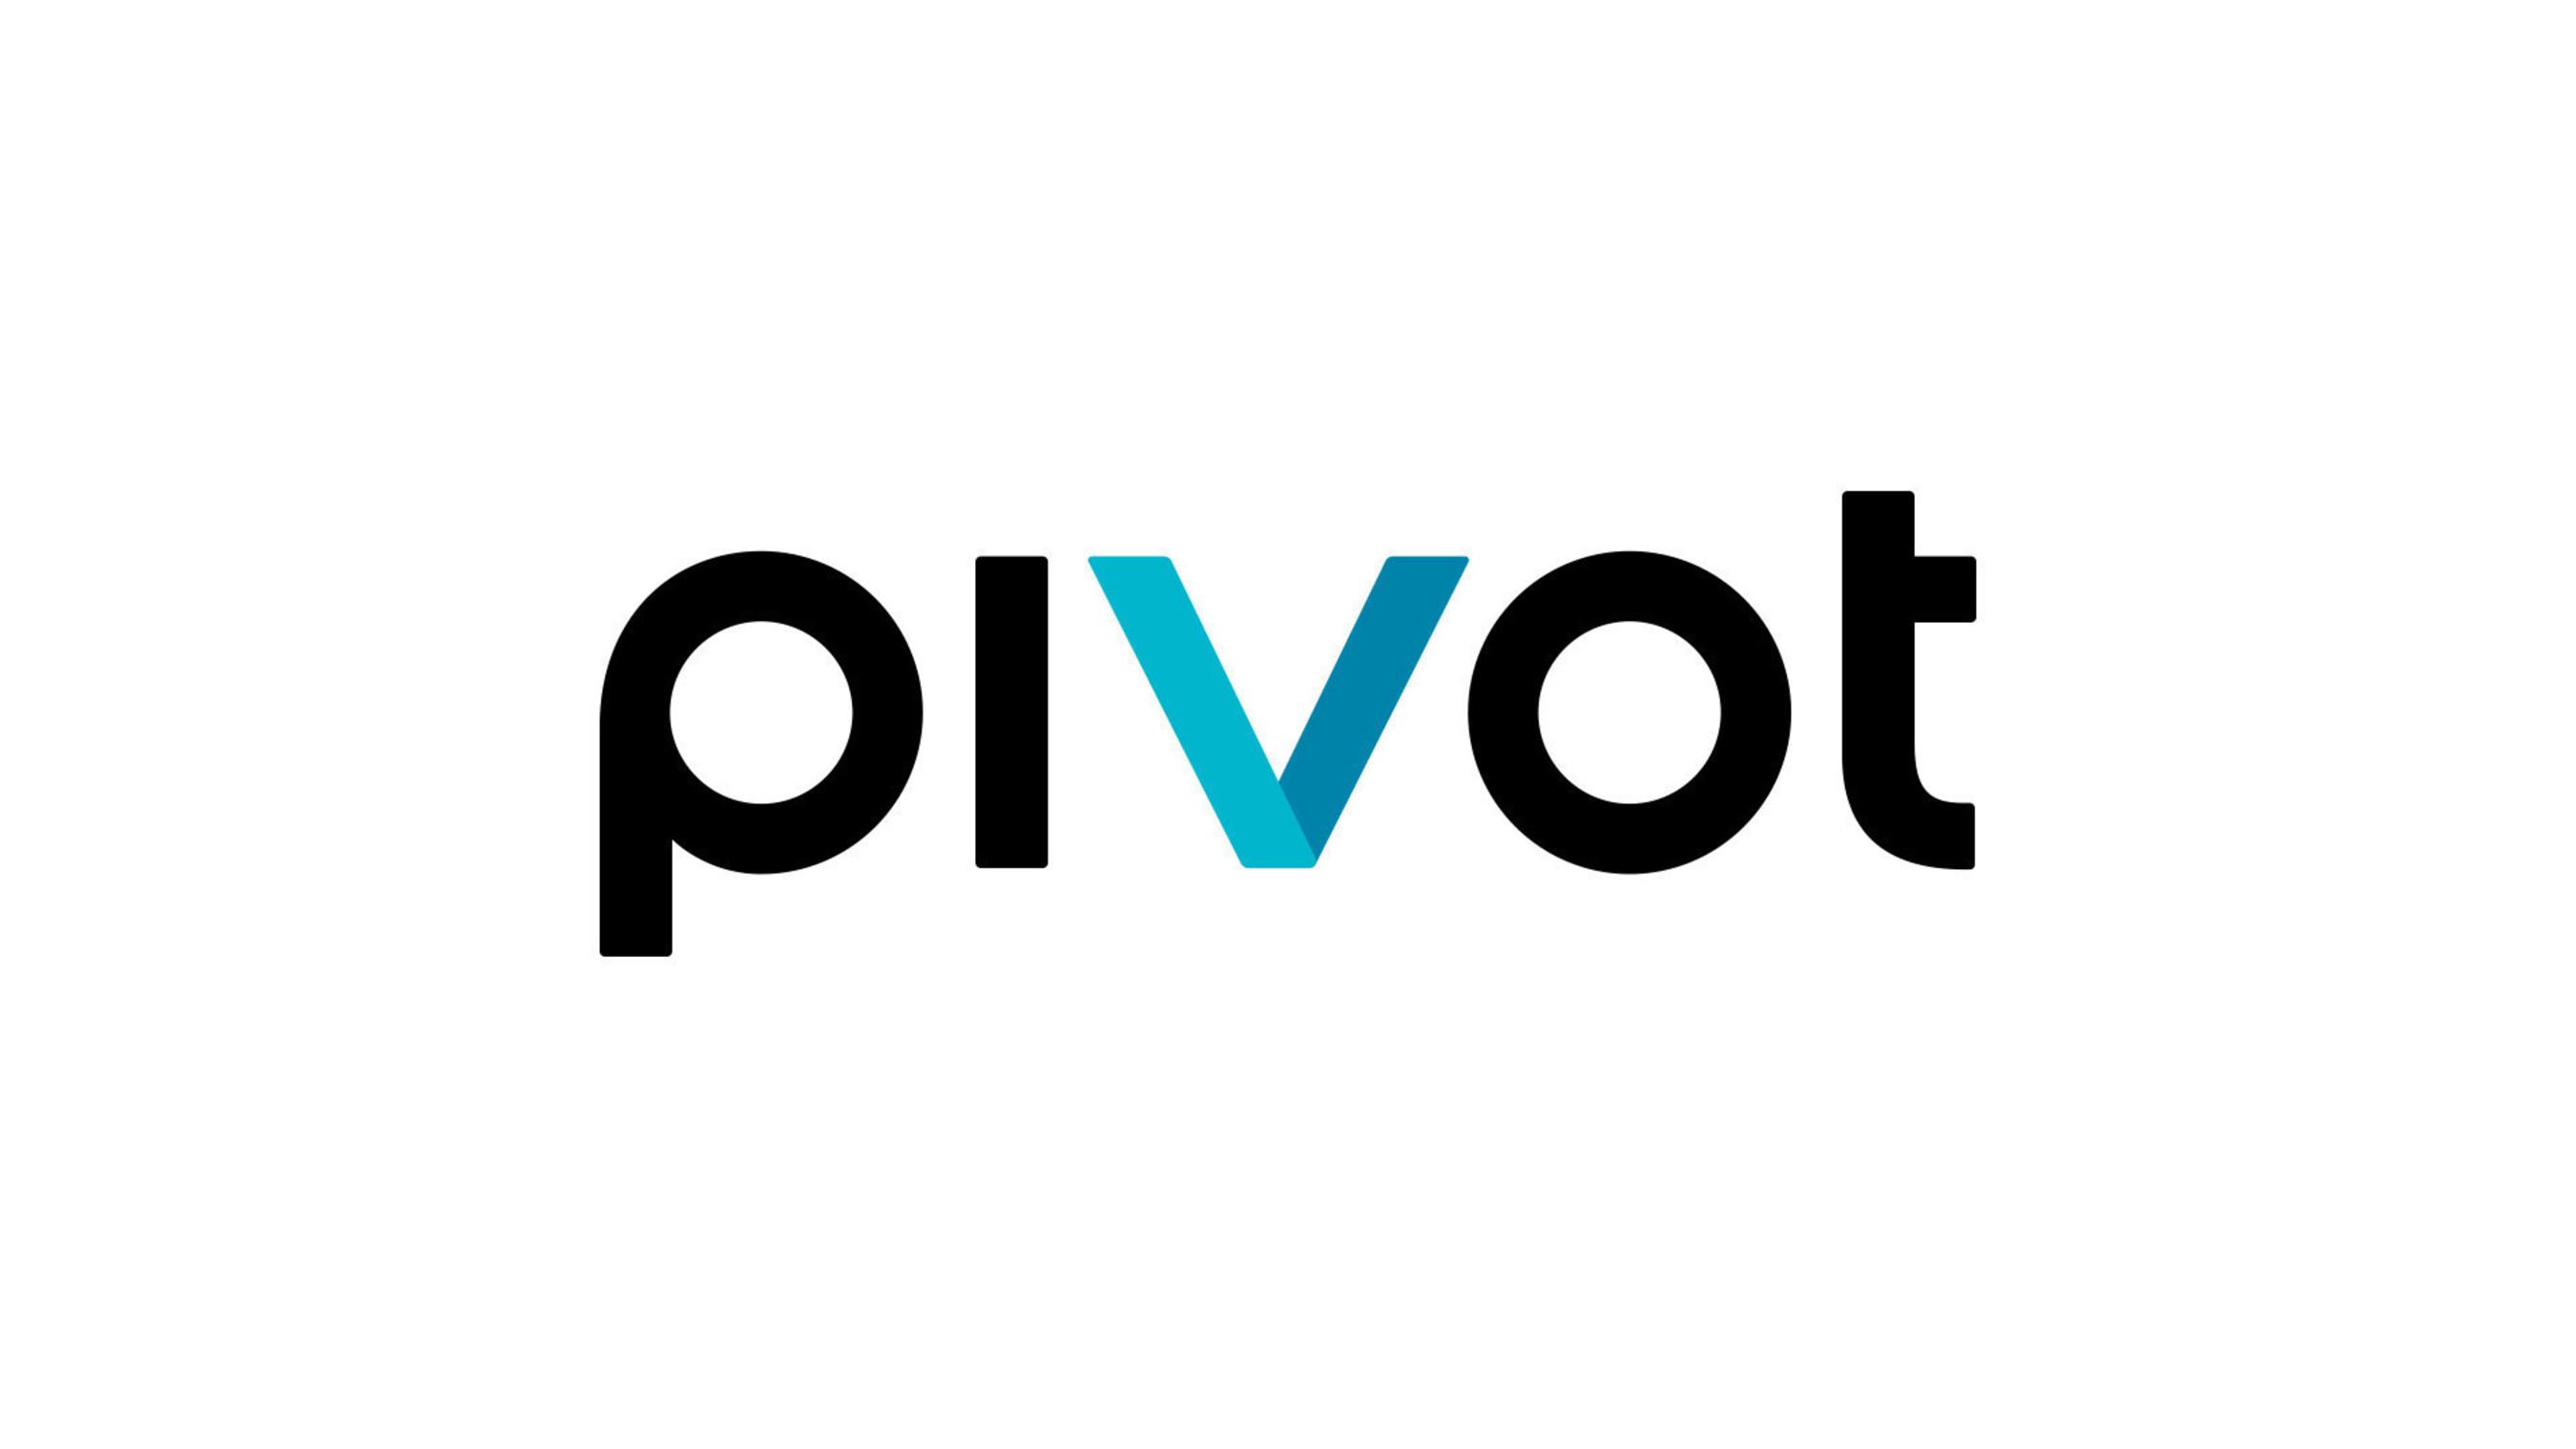 Official Pivot TV logo.